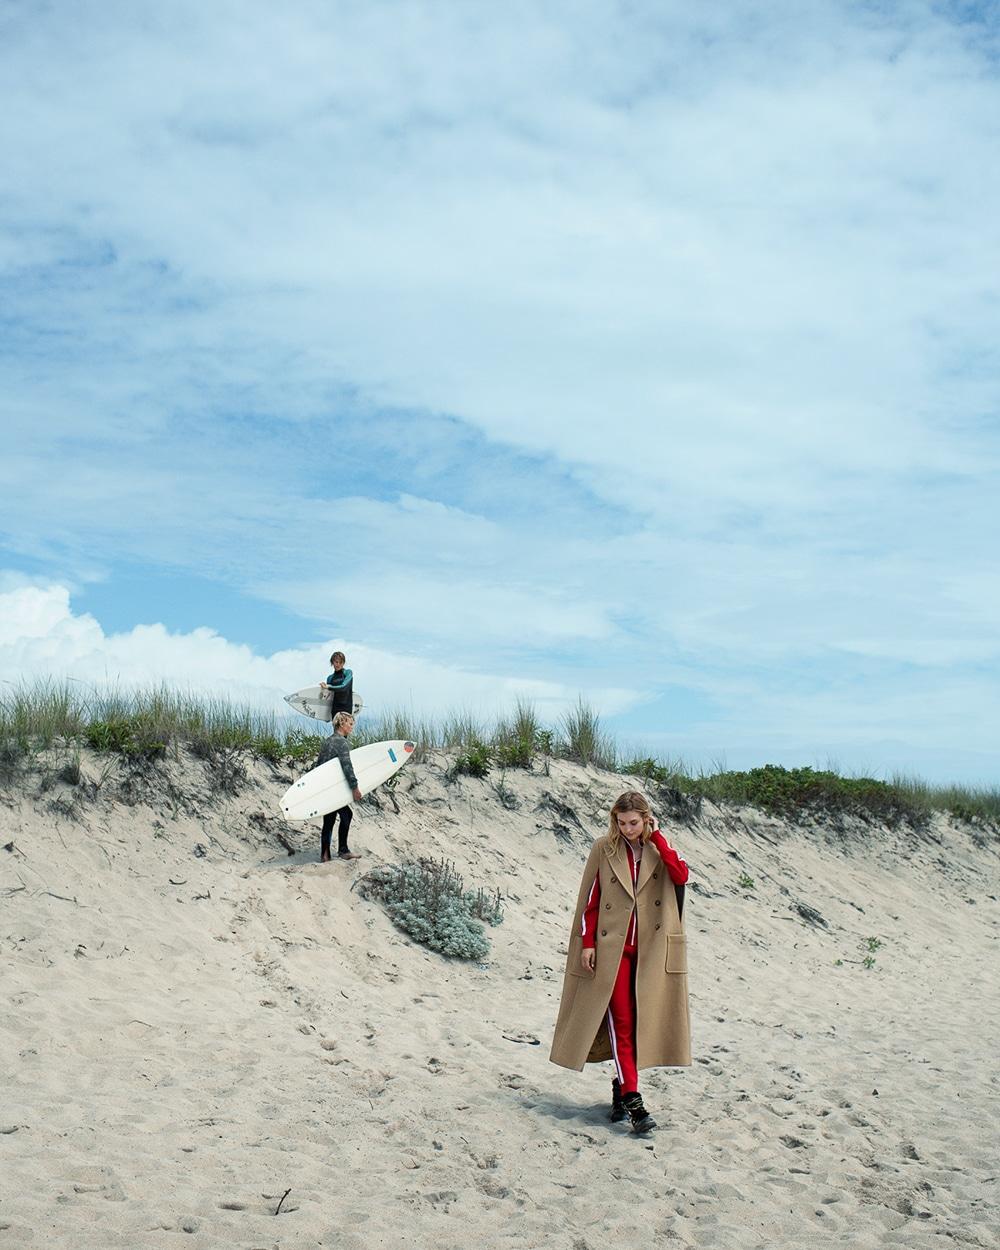 Roosmarijn-De-Kok-The-Gloss-Magazine-Anne-Menke-9.jpg